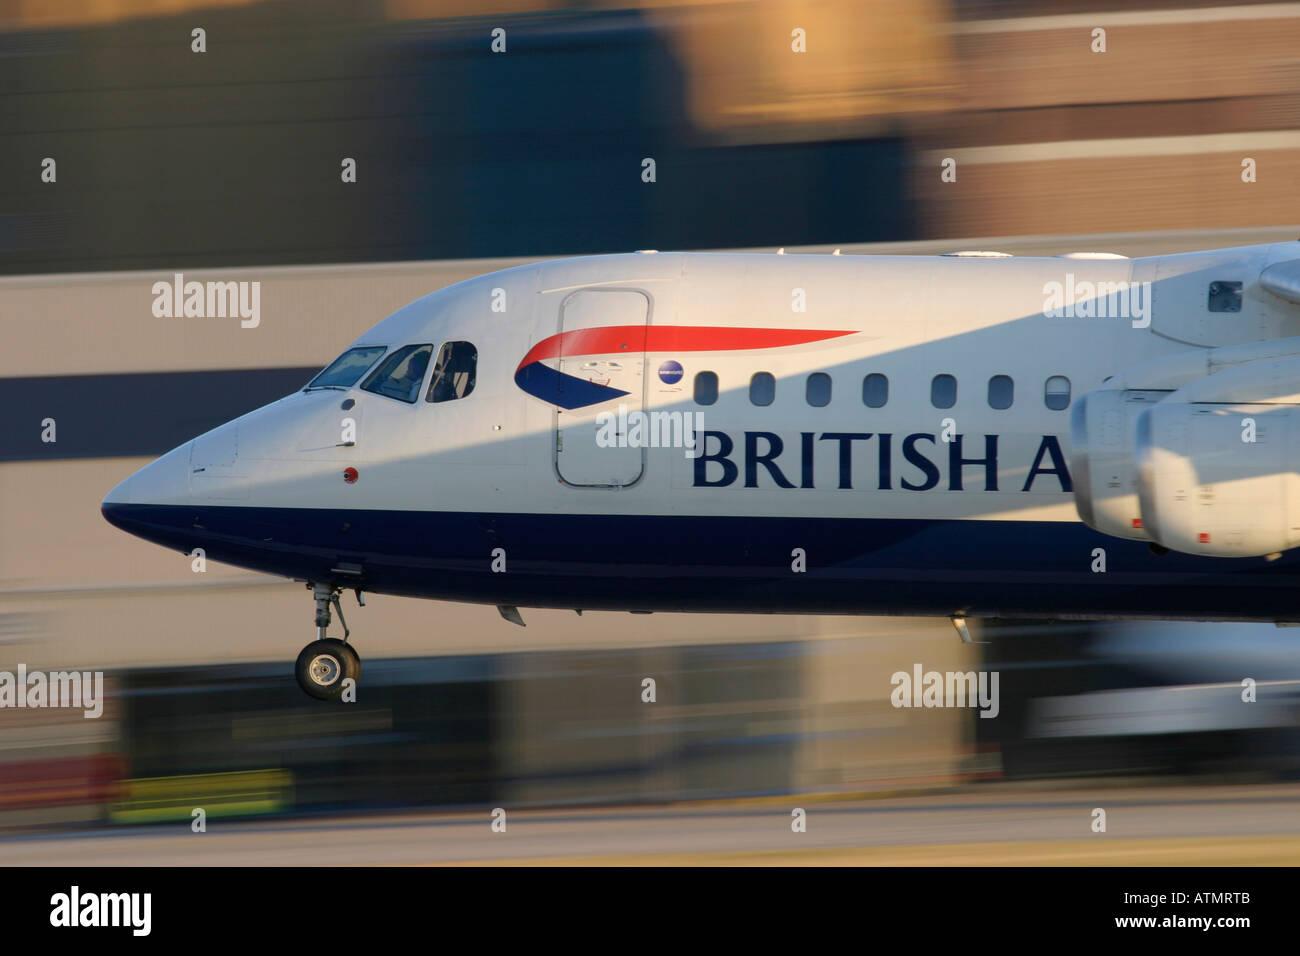 British Airways British Aerospace BAe-146-200A landing at London City Airport UK - Stock Image